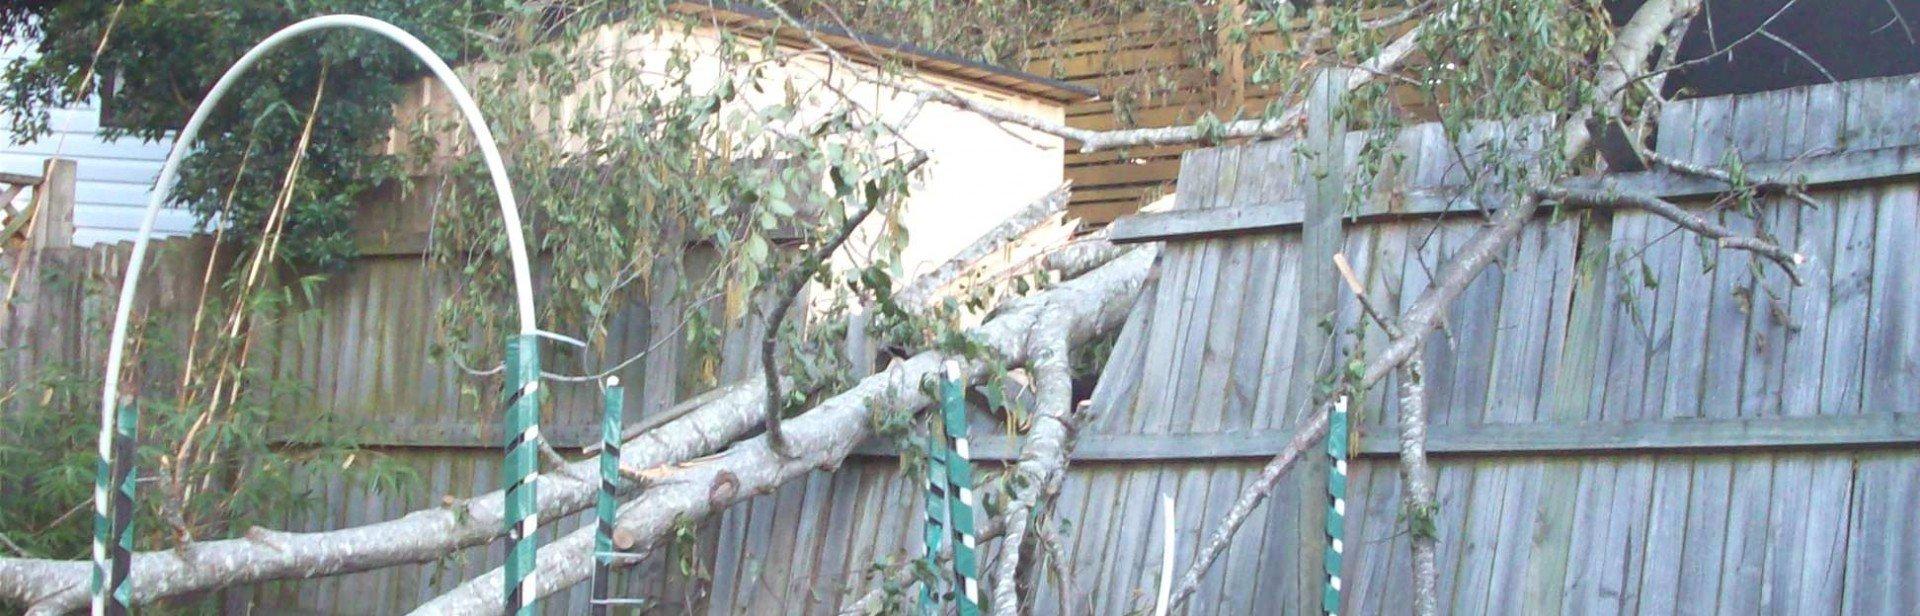 Tree Failed Fence - NSW Trees & Neighbours Legislation